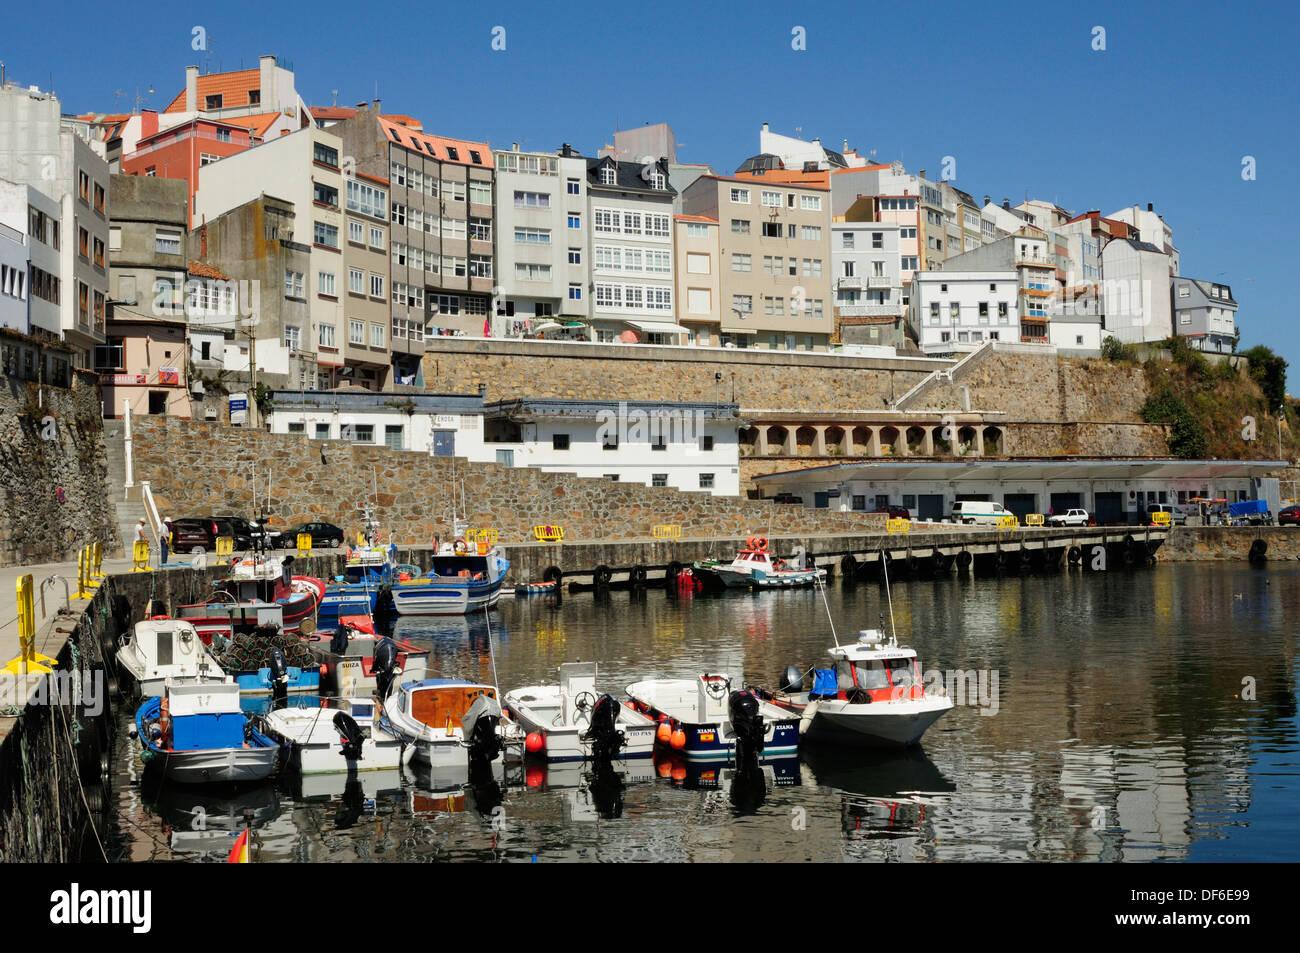 Port of Maplica - municipality of Malpica de Bergantinos